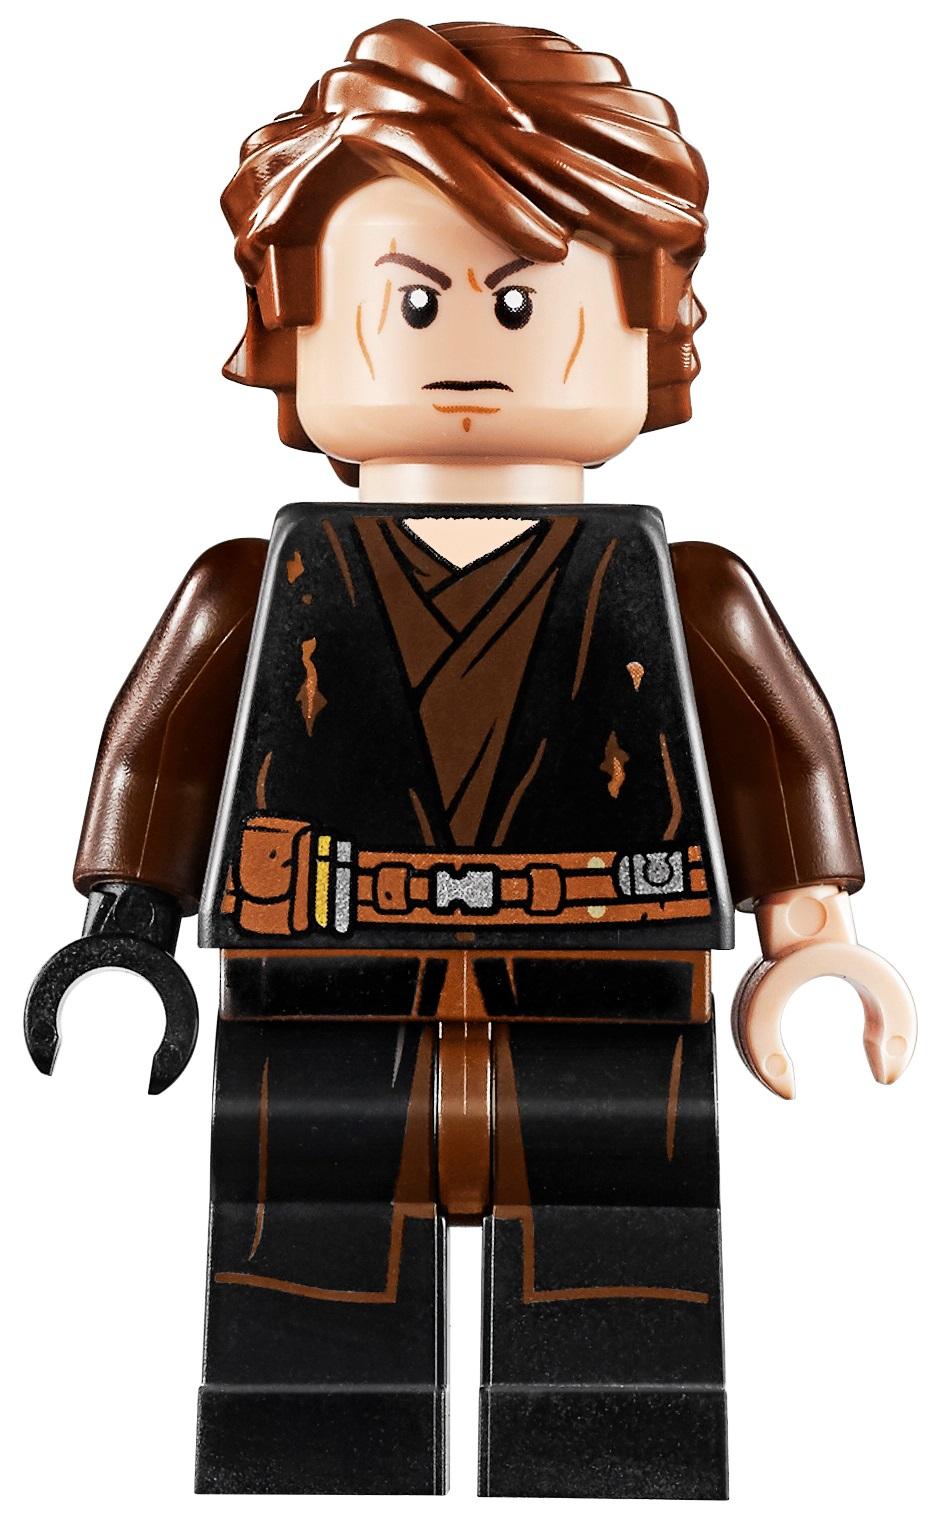 Lego Kylo Ren Minifig Lightsaber x 1 Trans Red with Dark Brown Hilt